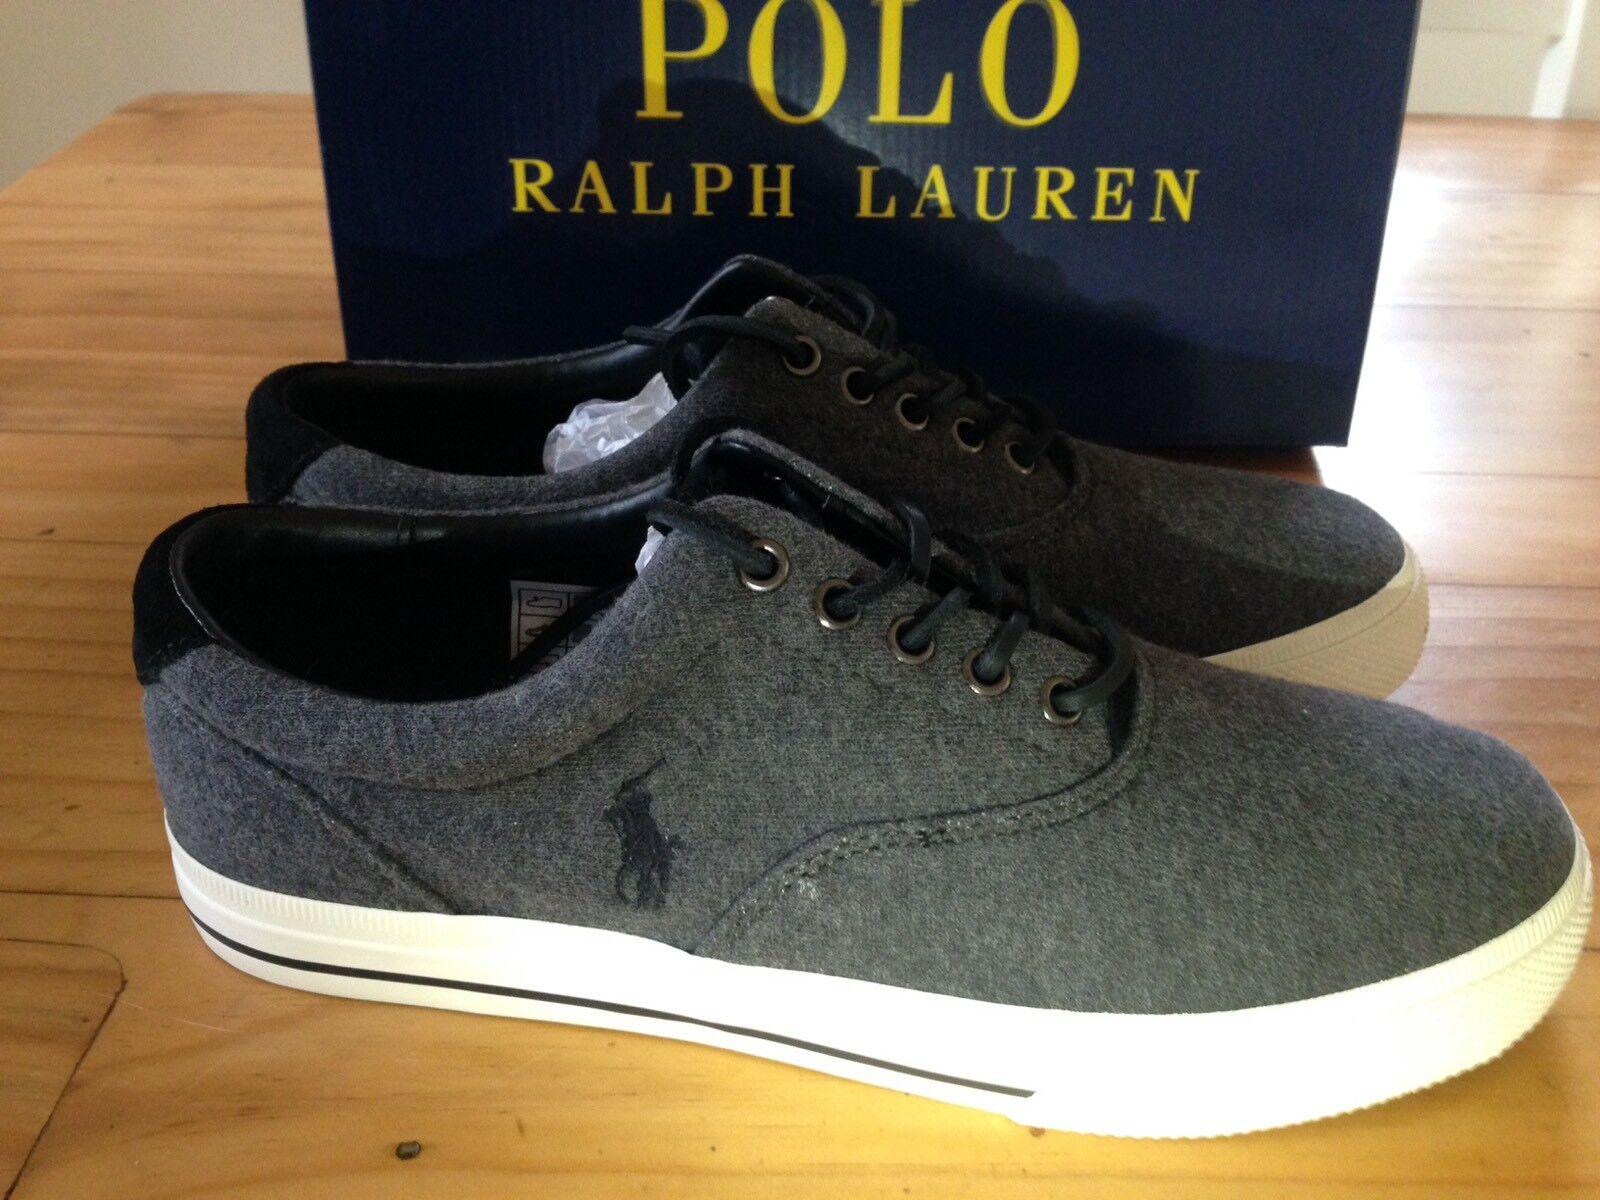 Ralph Lauren Polo Grey Vaughn shoes Trainers New In Box BNIB